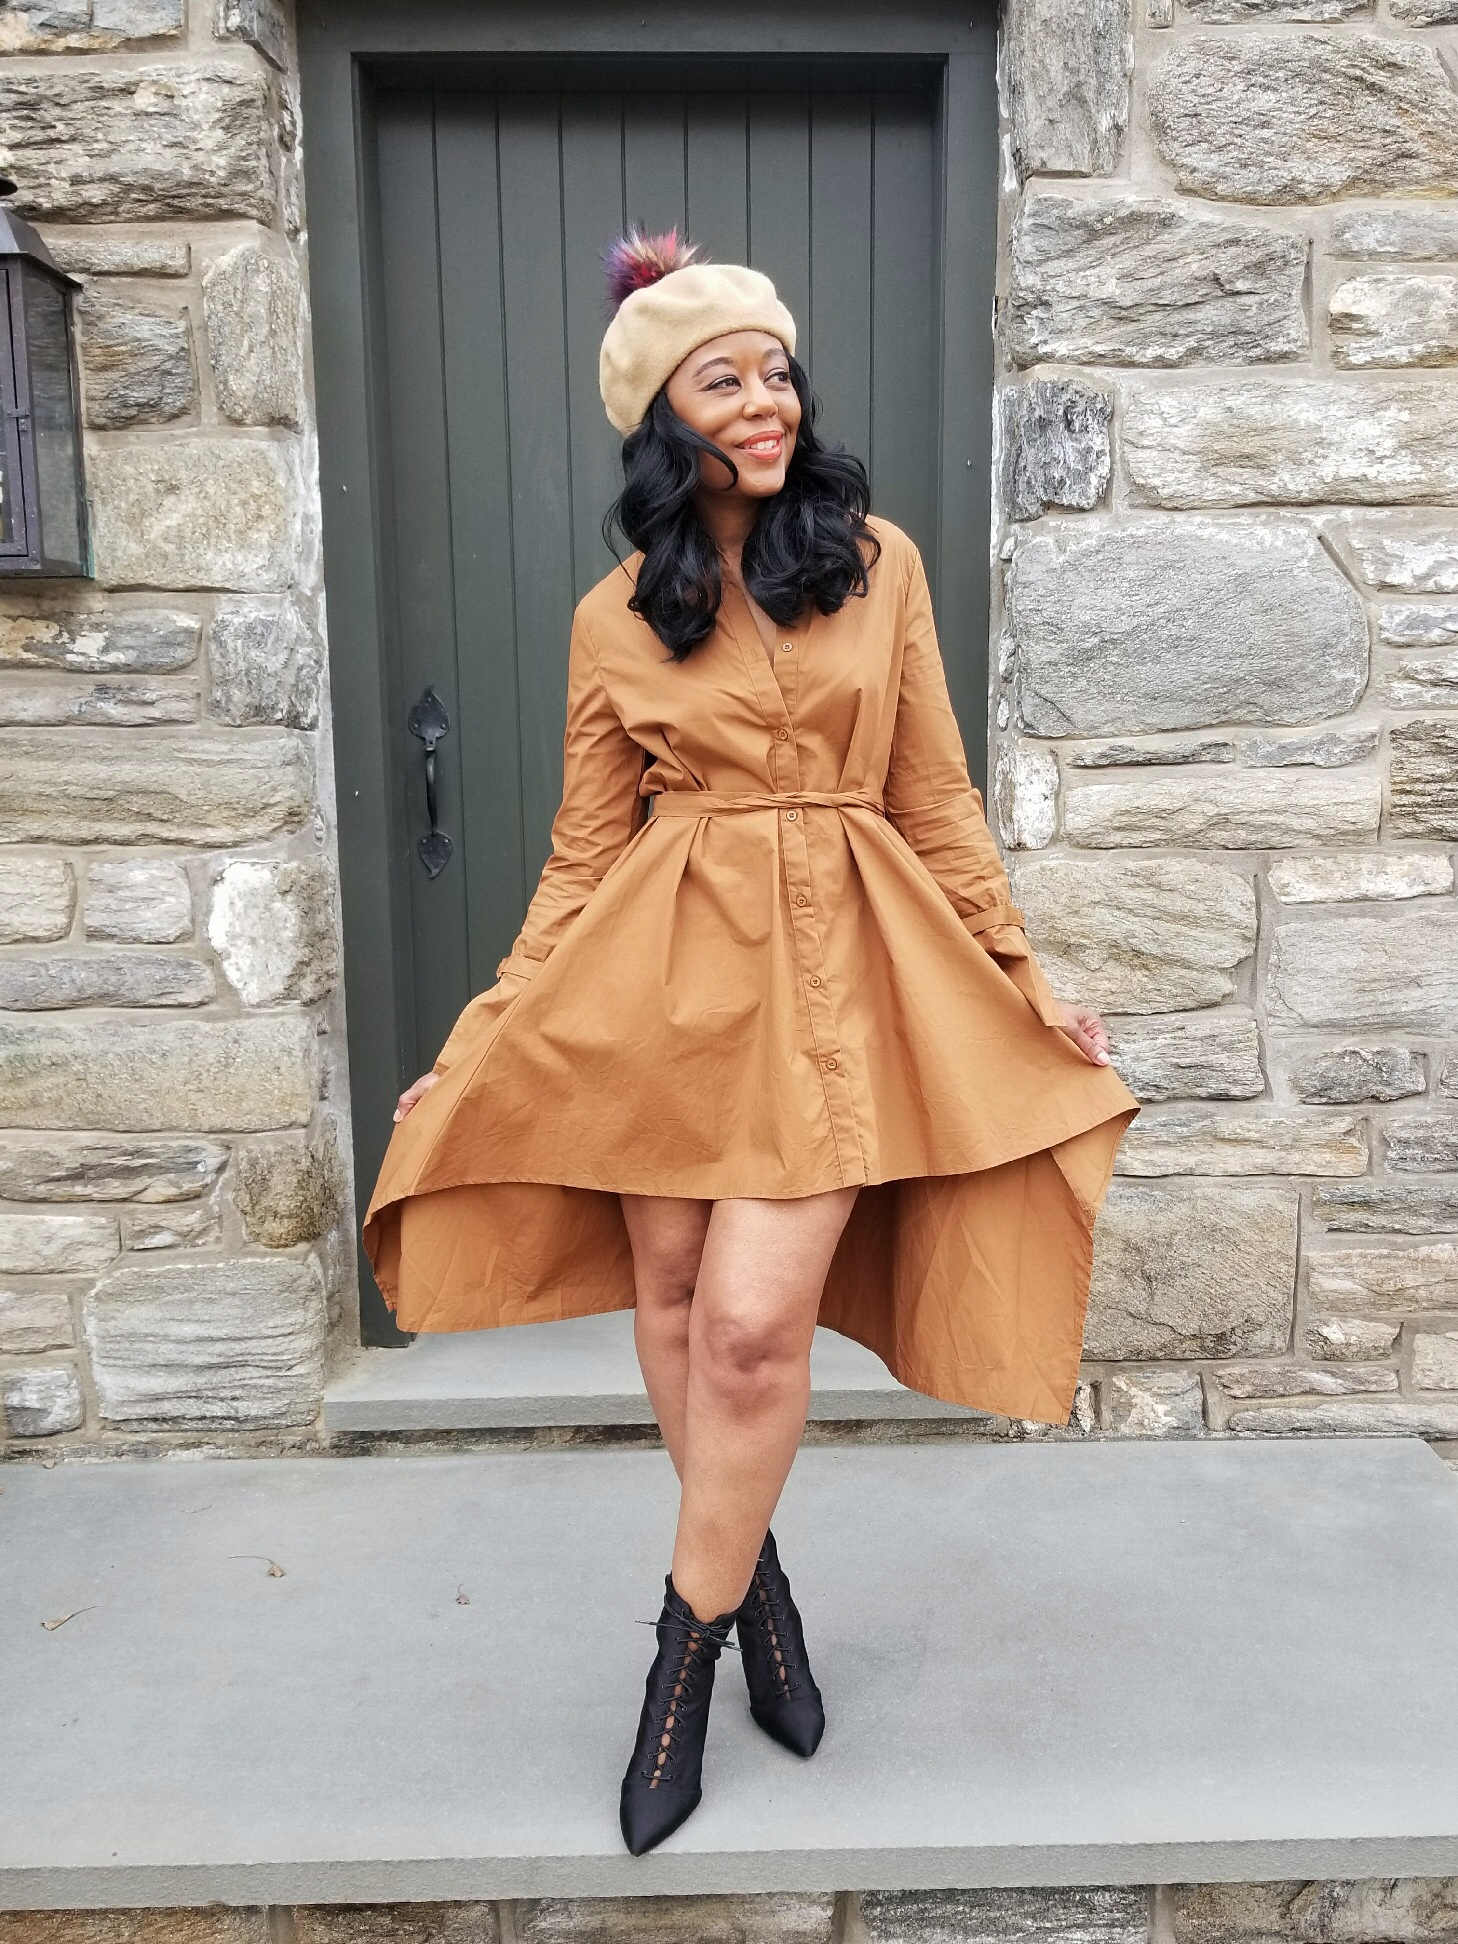 Dress( Eve Lawrence Boutique ) | Booties( Chicopolitan ) | Beret(Forever21) | Sandals(old)